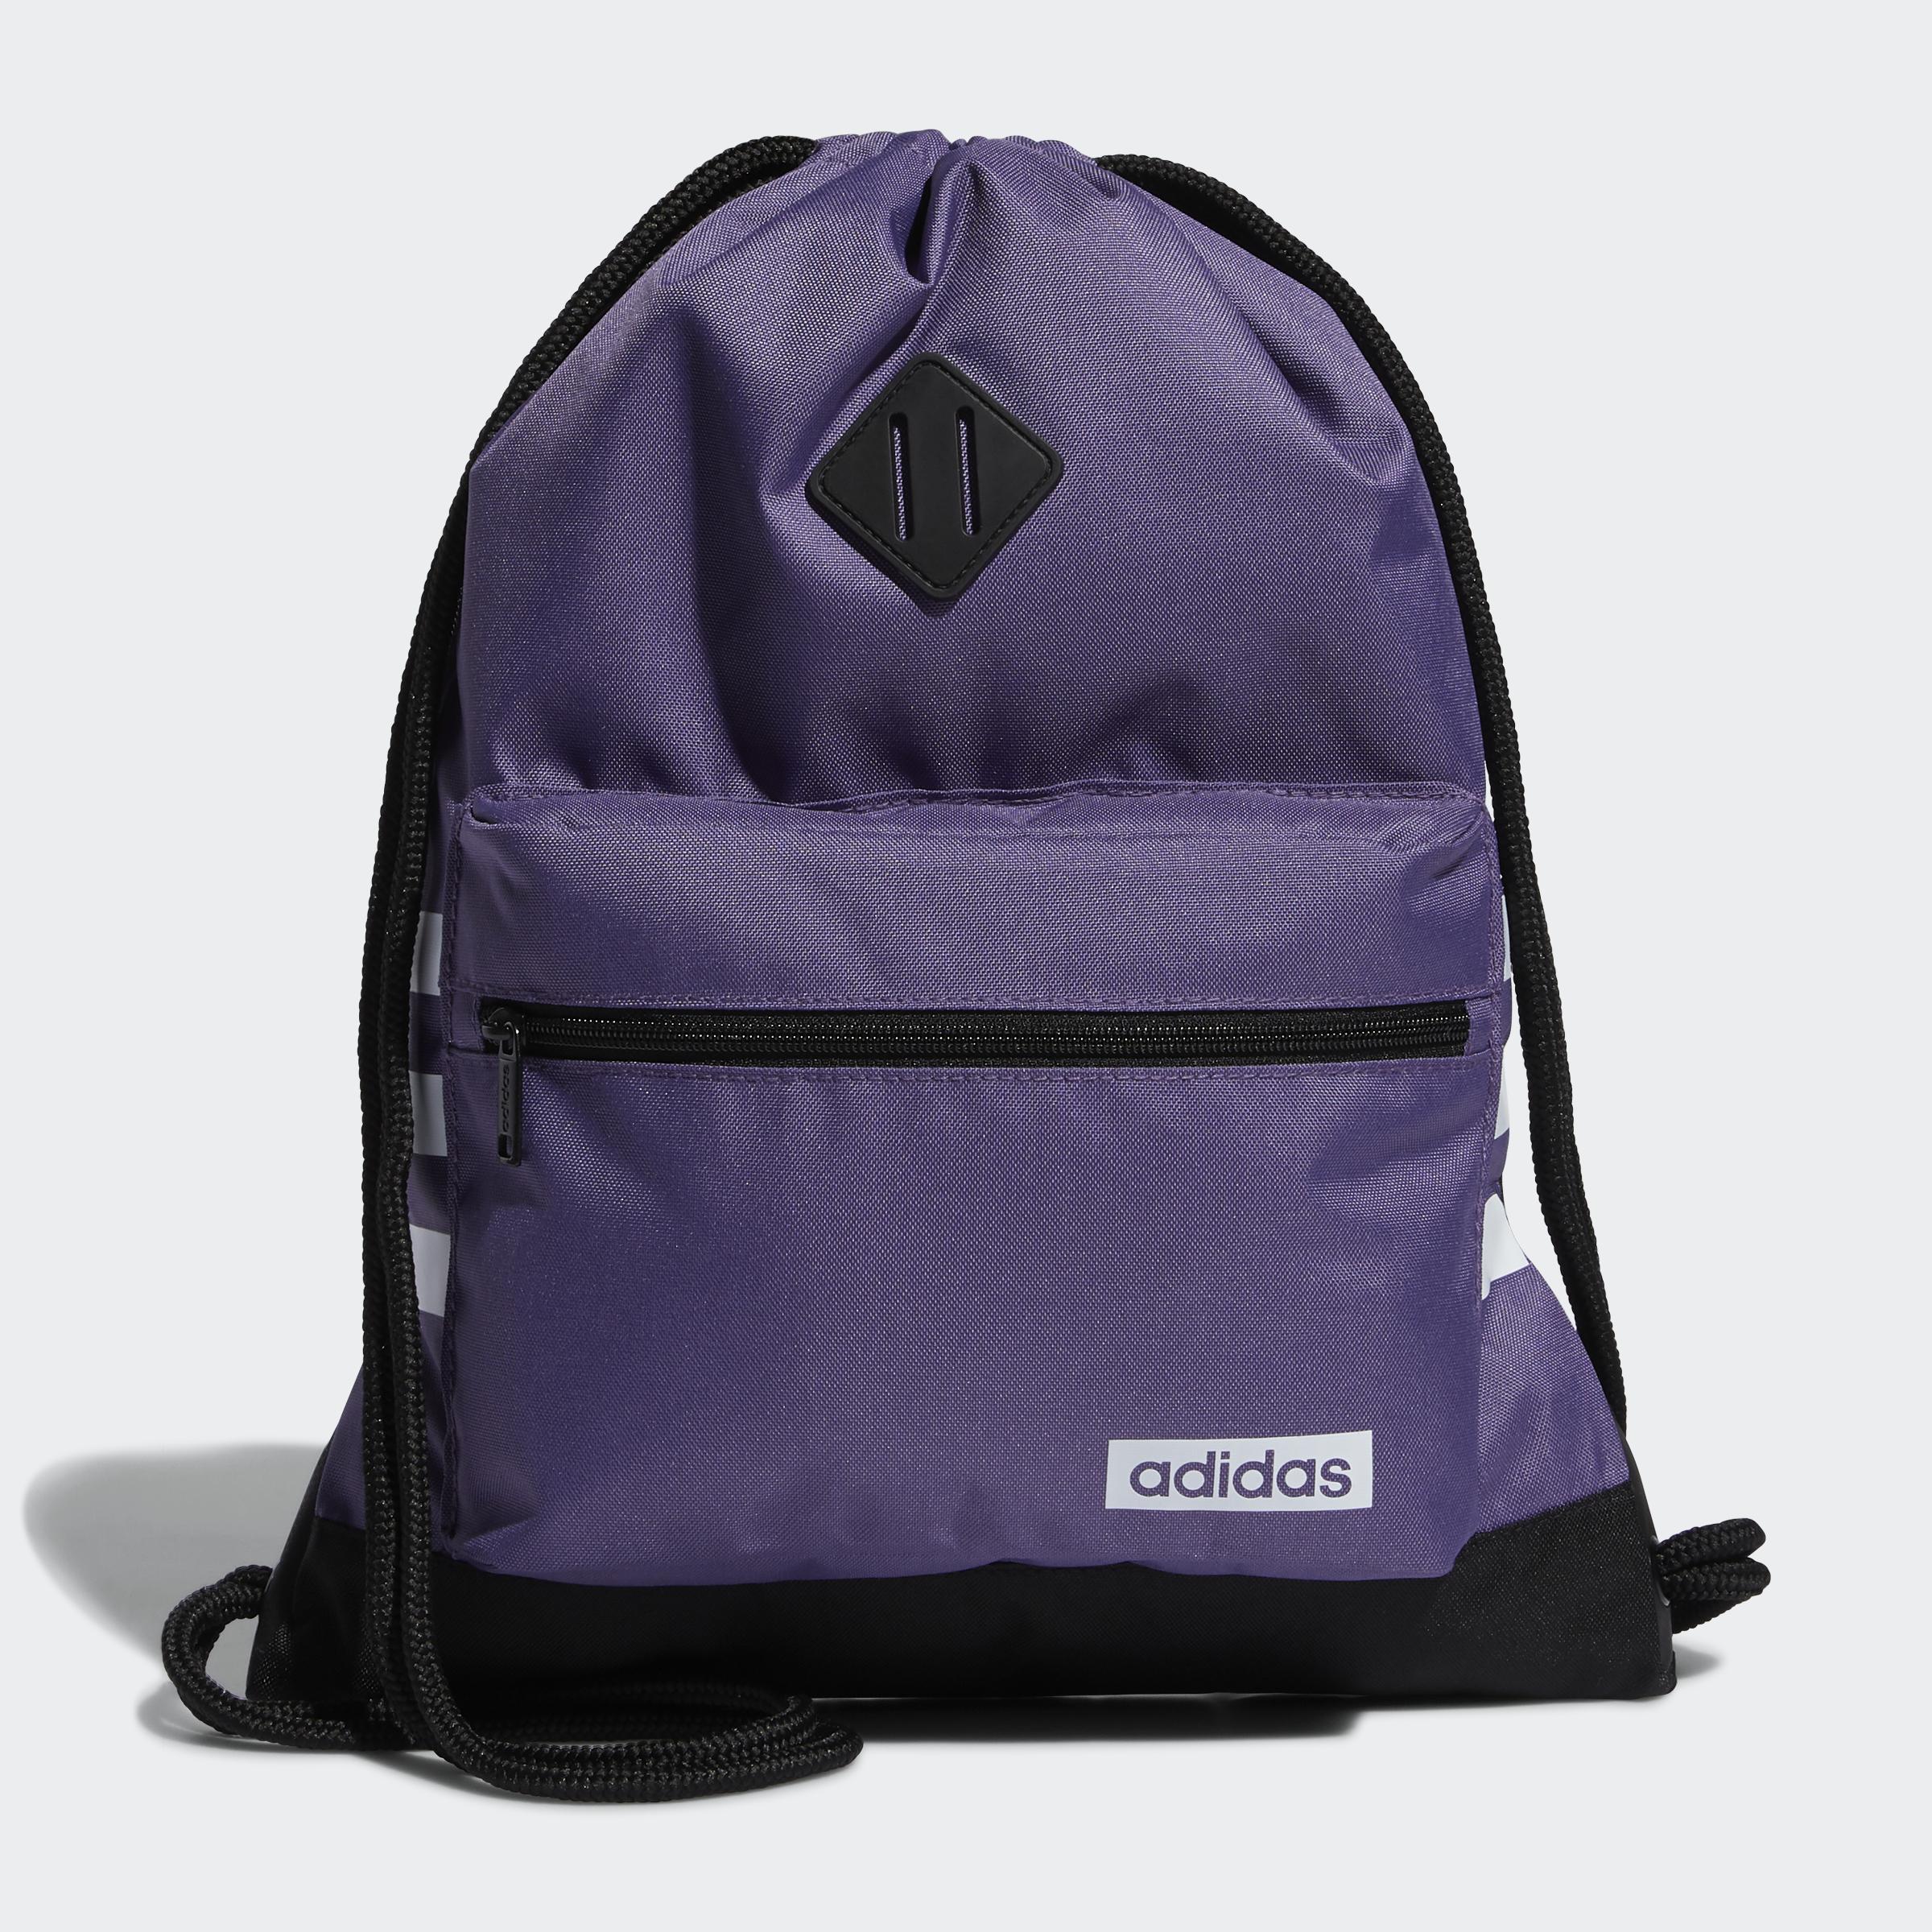 adidas-Classic-3-Stripes-Sackpack-Bags thumbnail 8